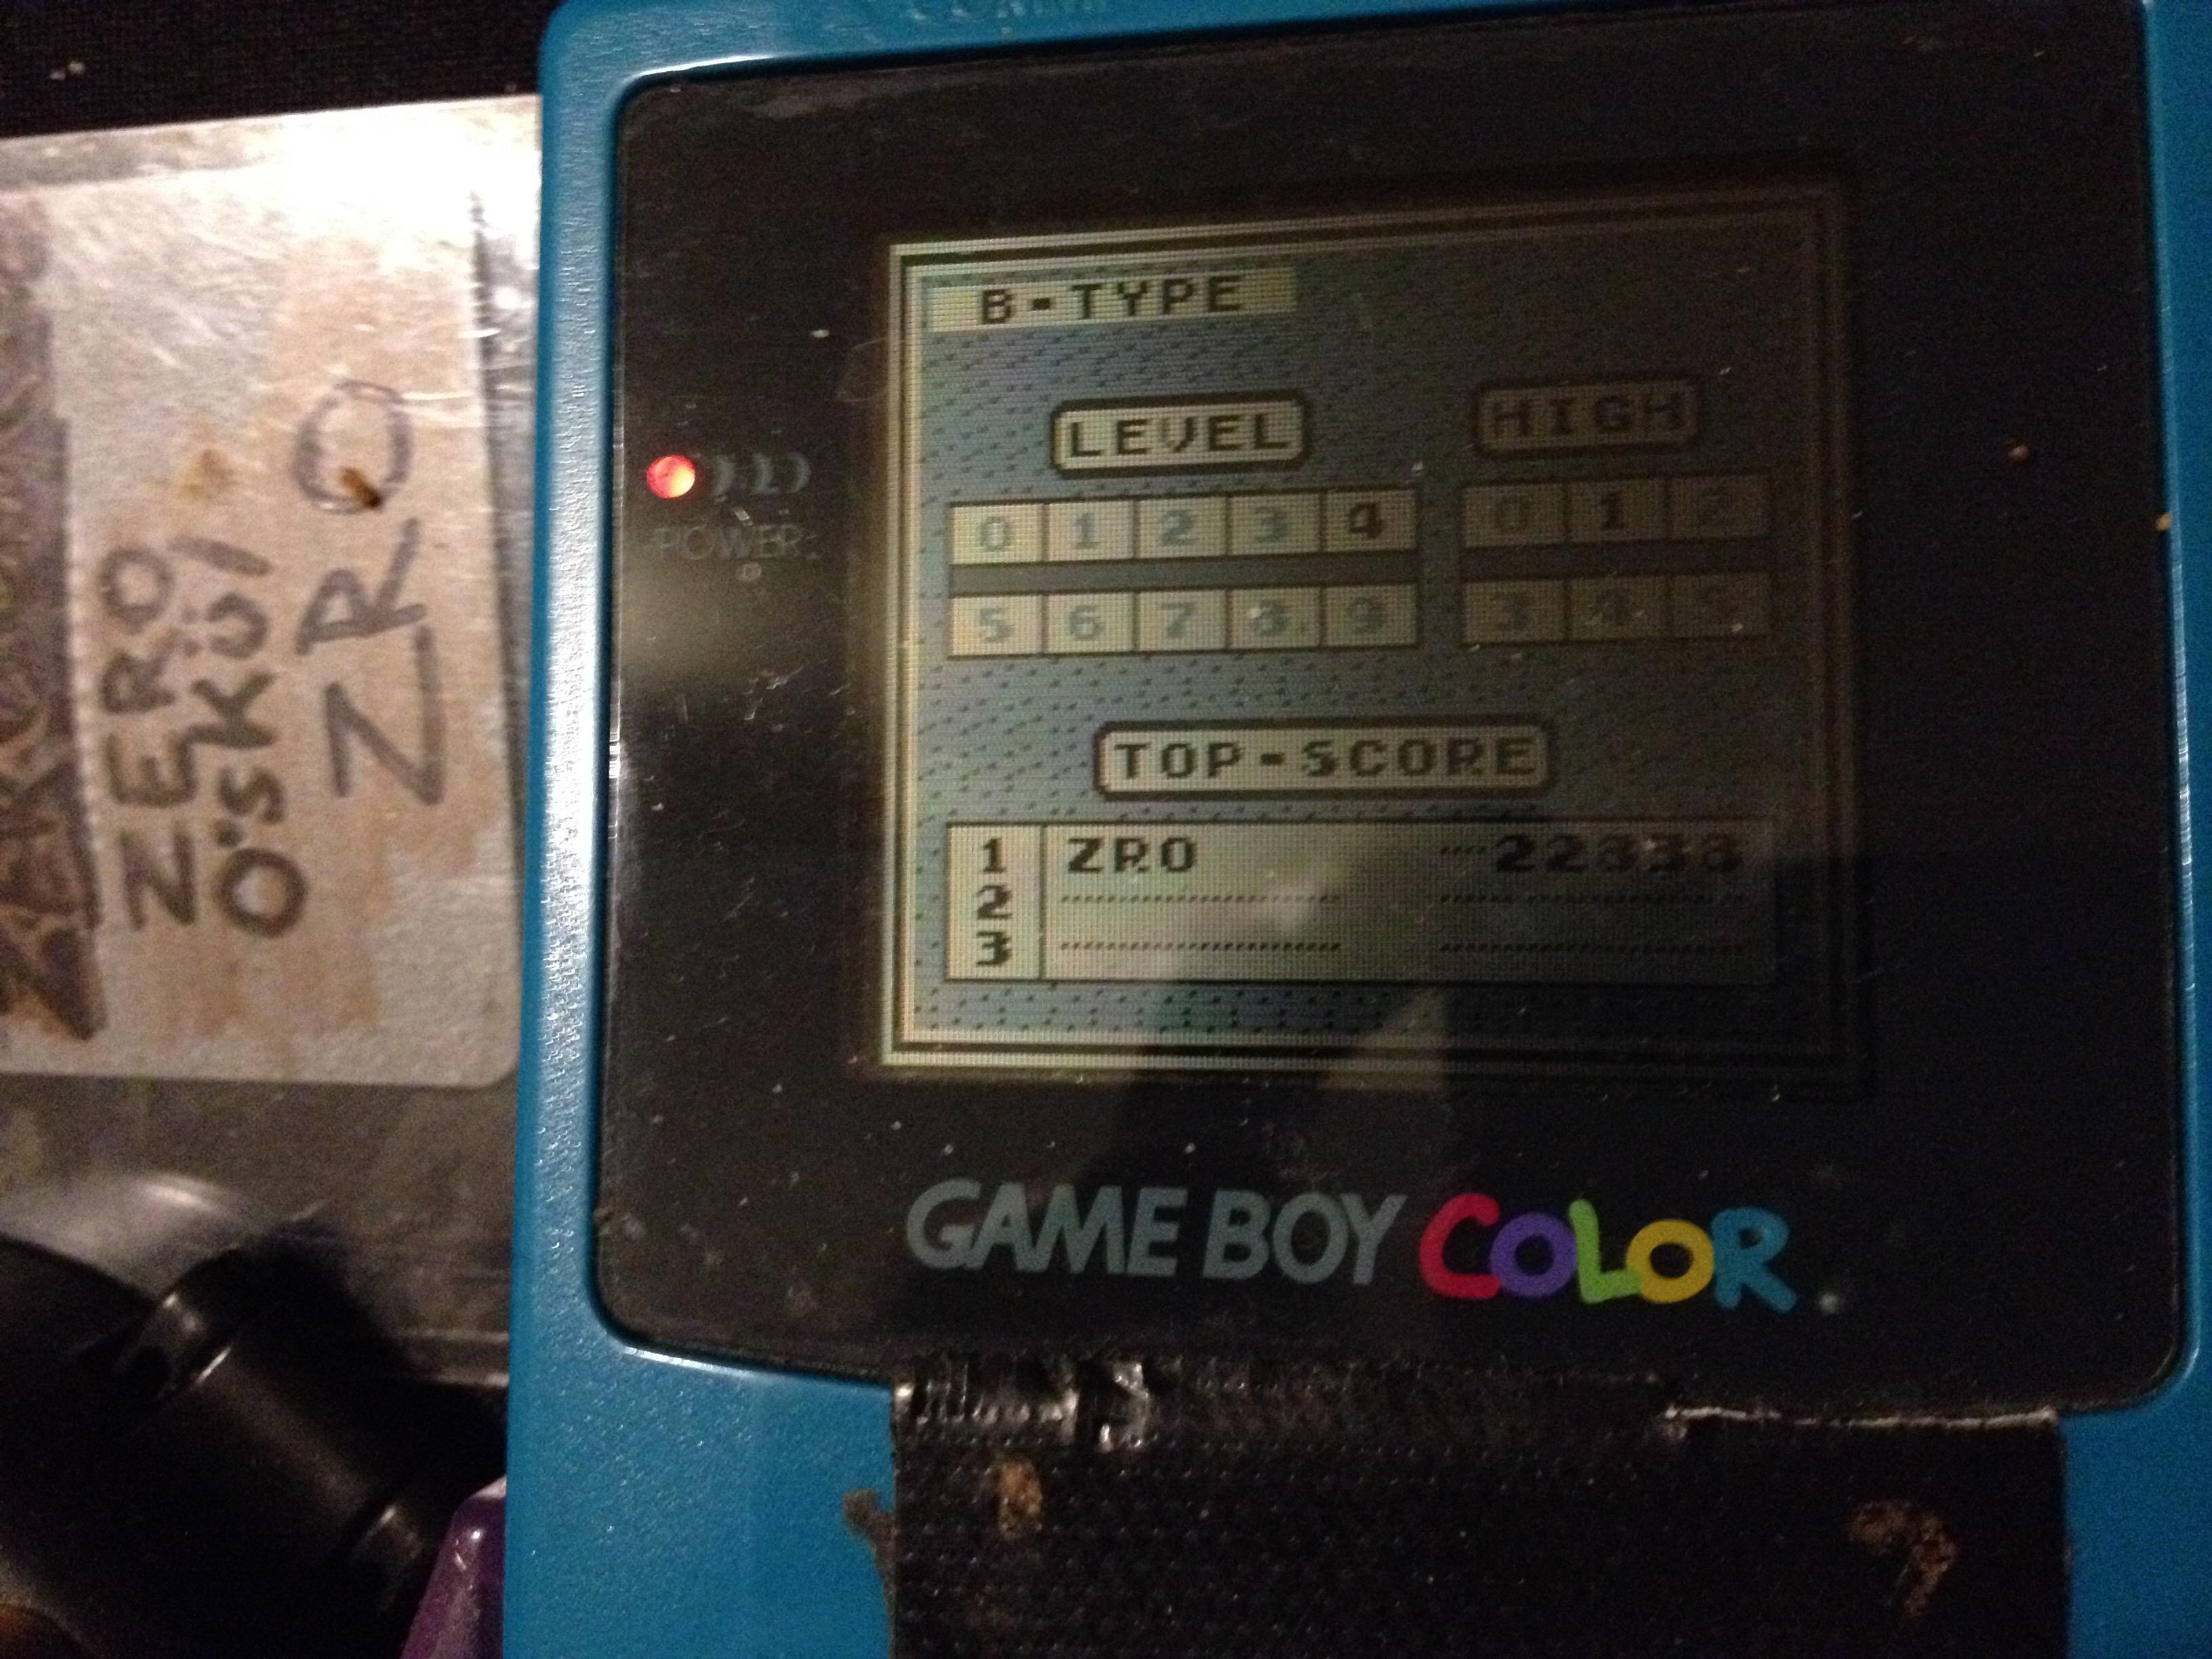 zerooskul: Tetris: Type B [Level 4 / High 1] (Game Boy) 22,838 points on 2019-12-09 12:10:29